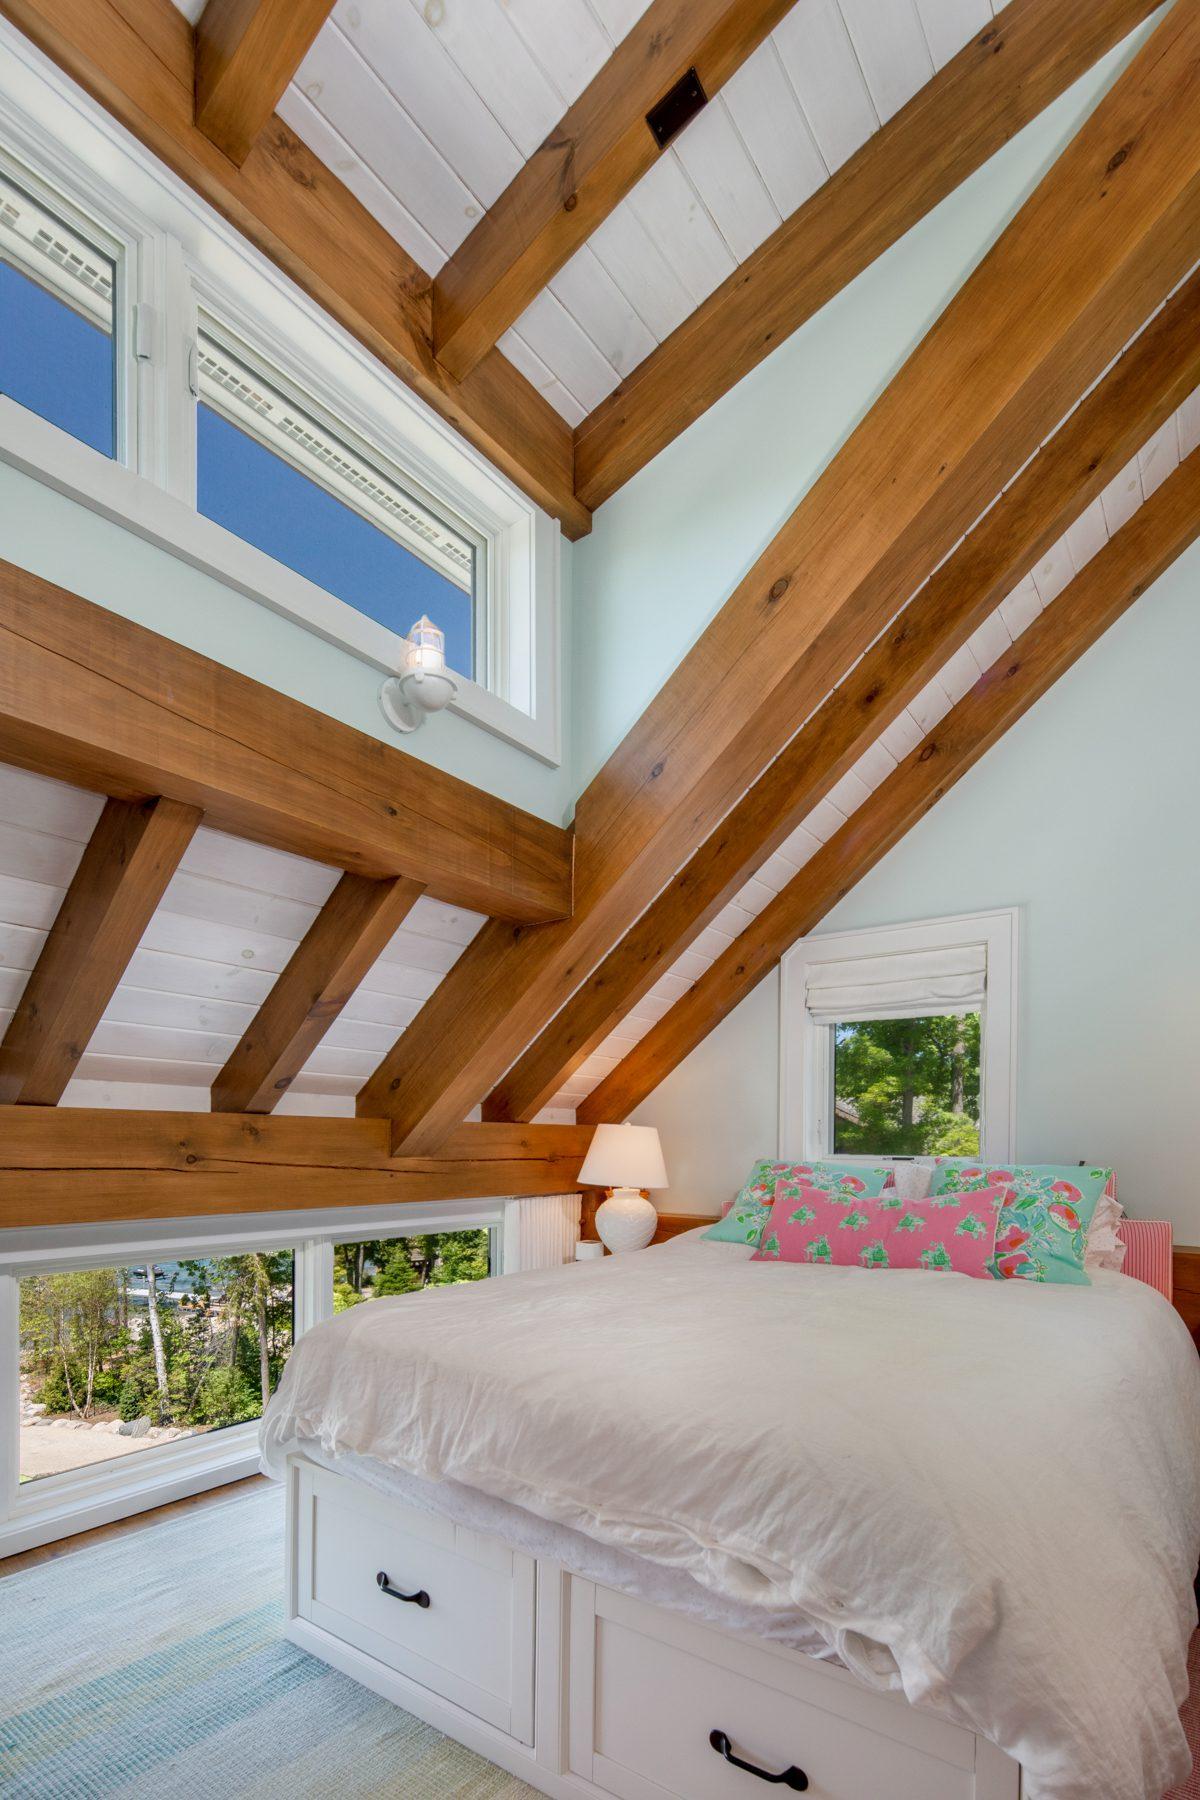 Normerica-Timber-Homes-Timber-Frame-Portfolio-Beachside-Bliss-Interior-Girl-Bedroom-Loft